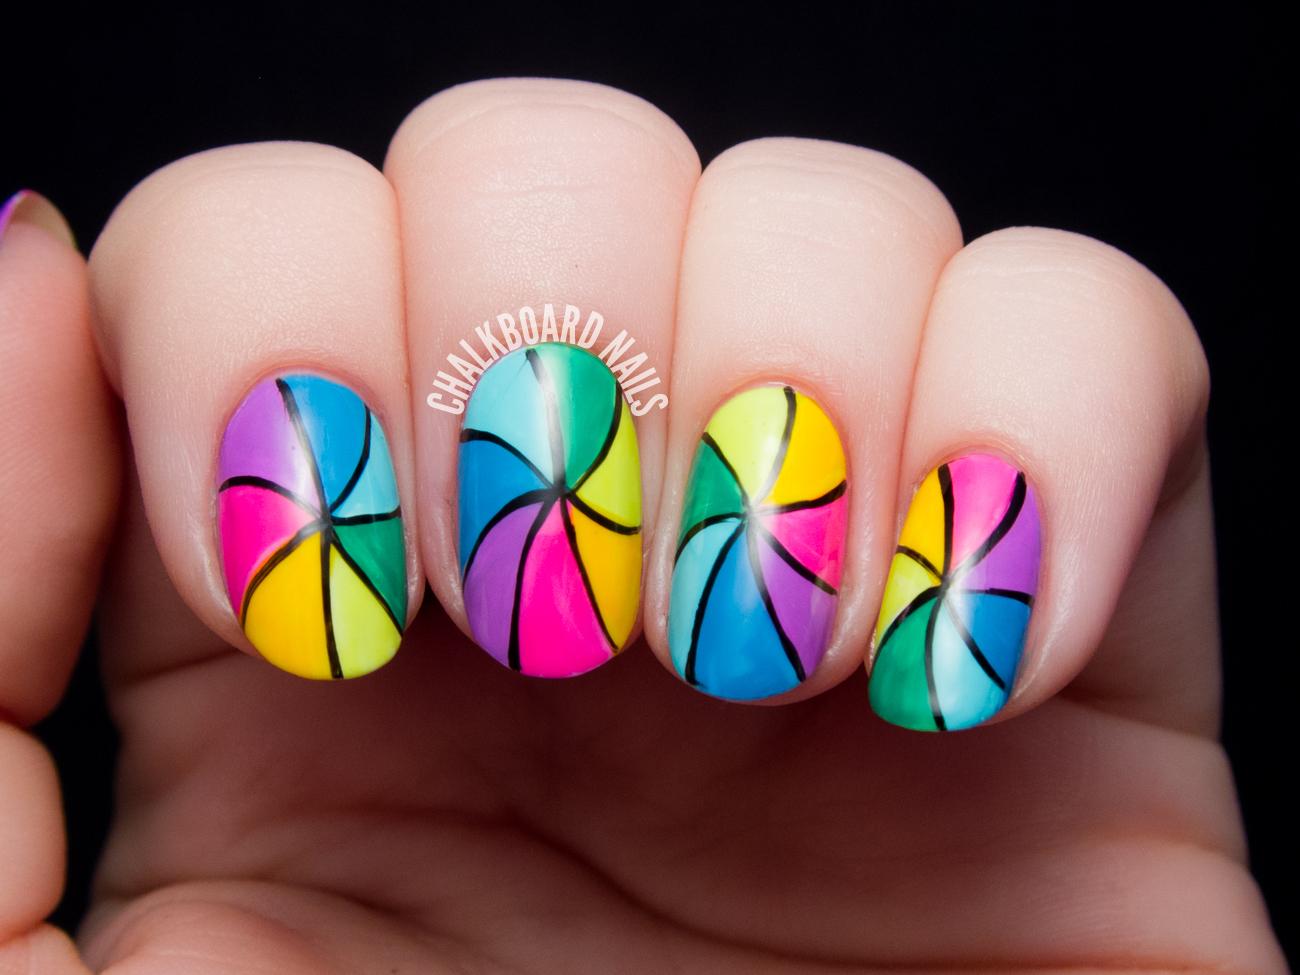 Rainbow pinwheel nail art by @chalkboardnails